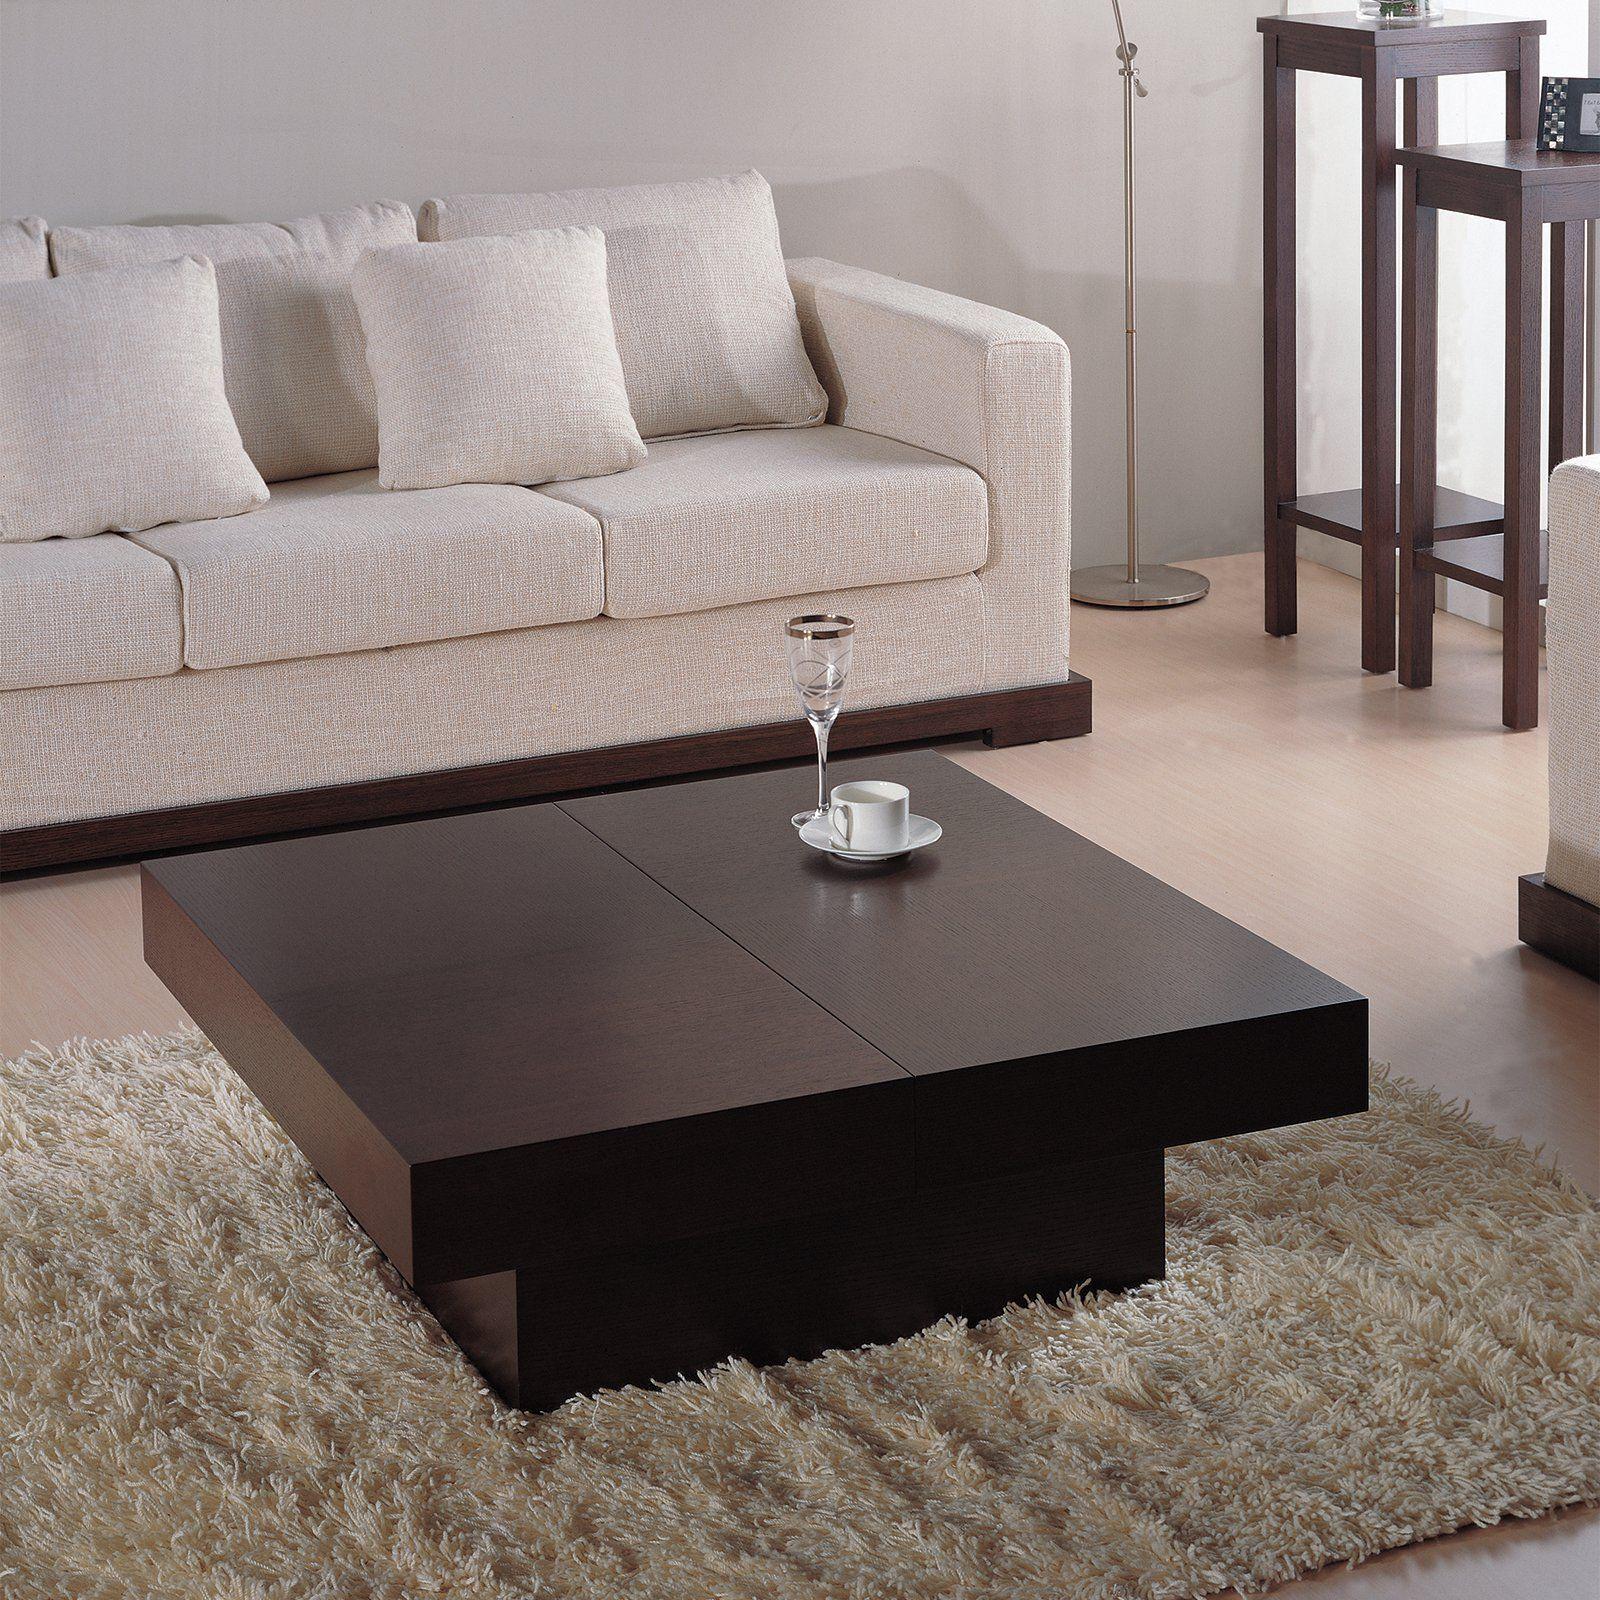 Nile Square Coffee Table Dark Brown Oak Coffee Table Coffee Table Square Coffee Table Wood